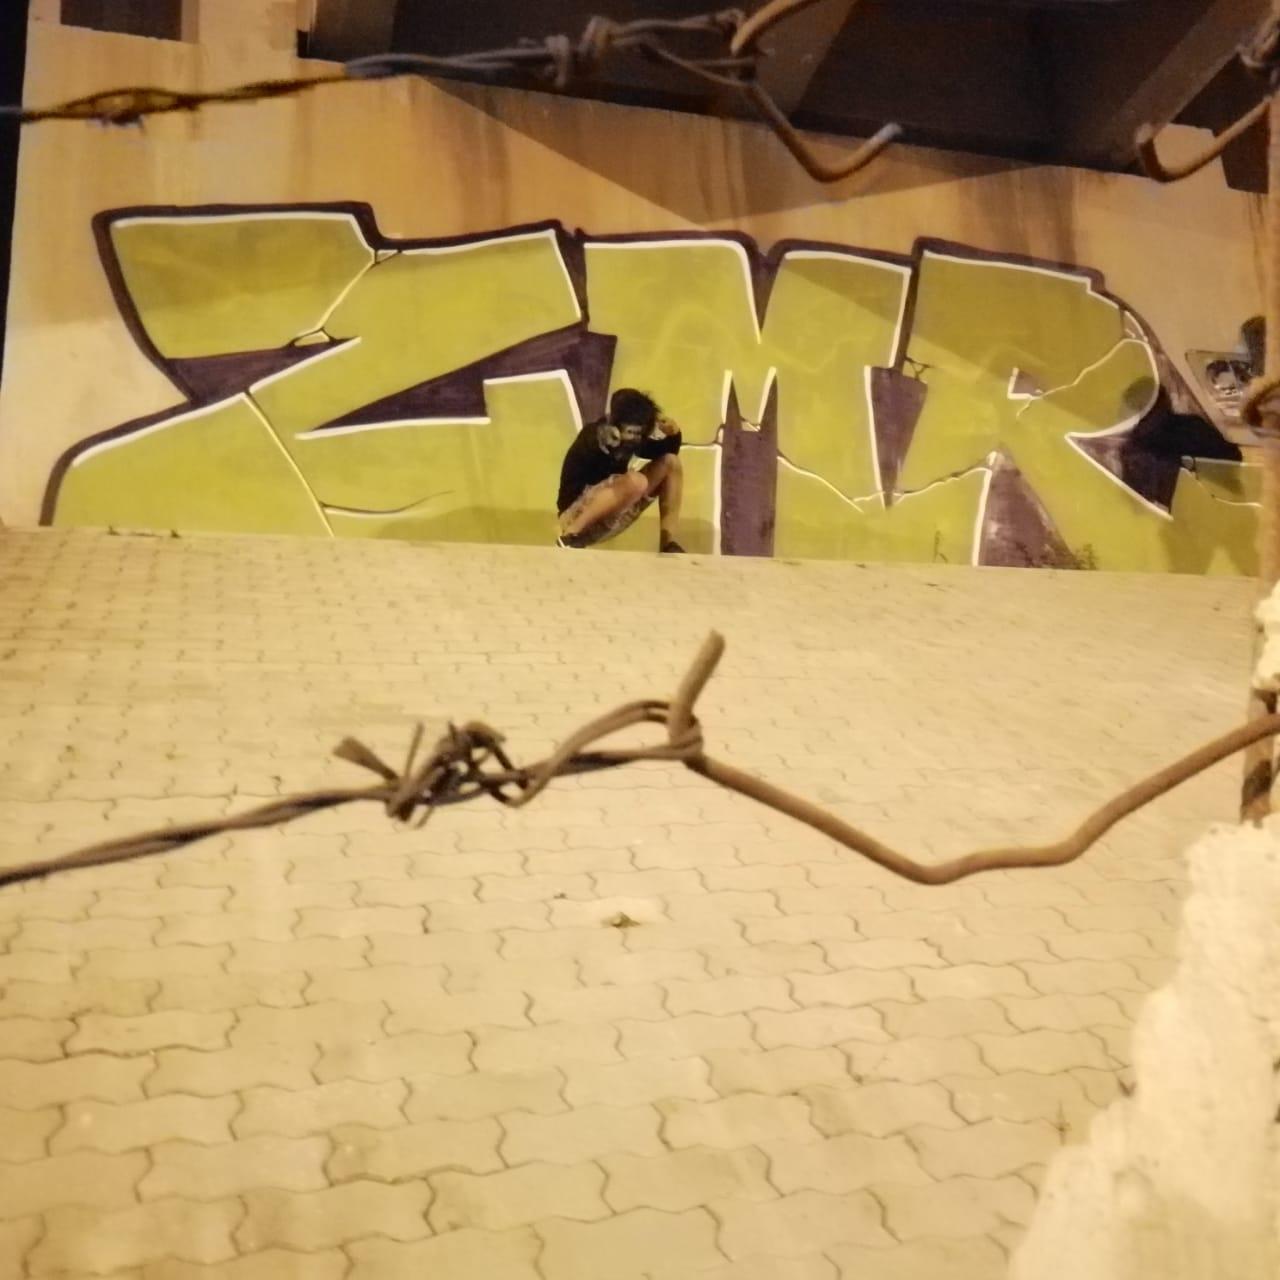 bloc letter, ZMR, crew, Maroc, life, street